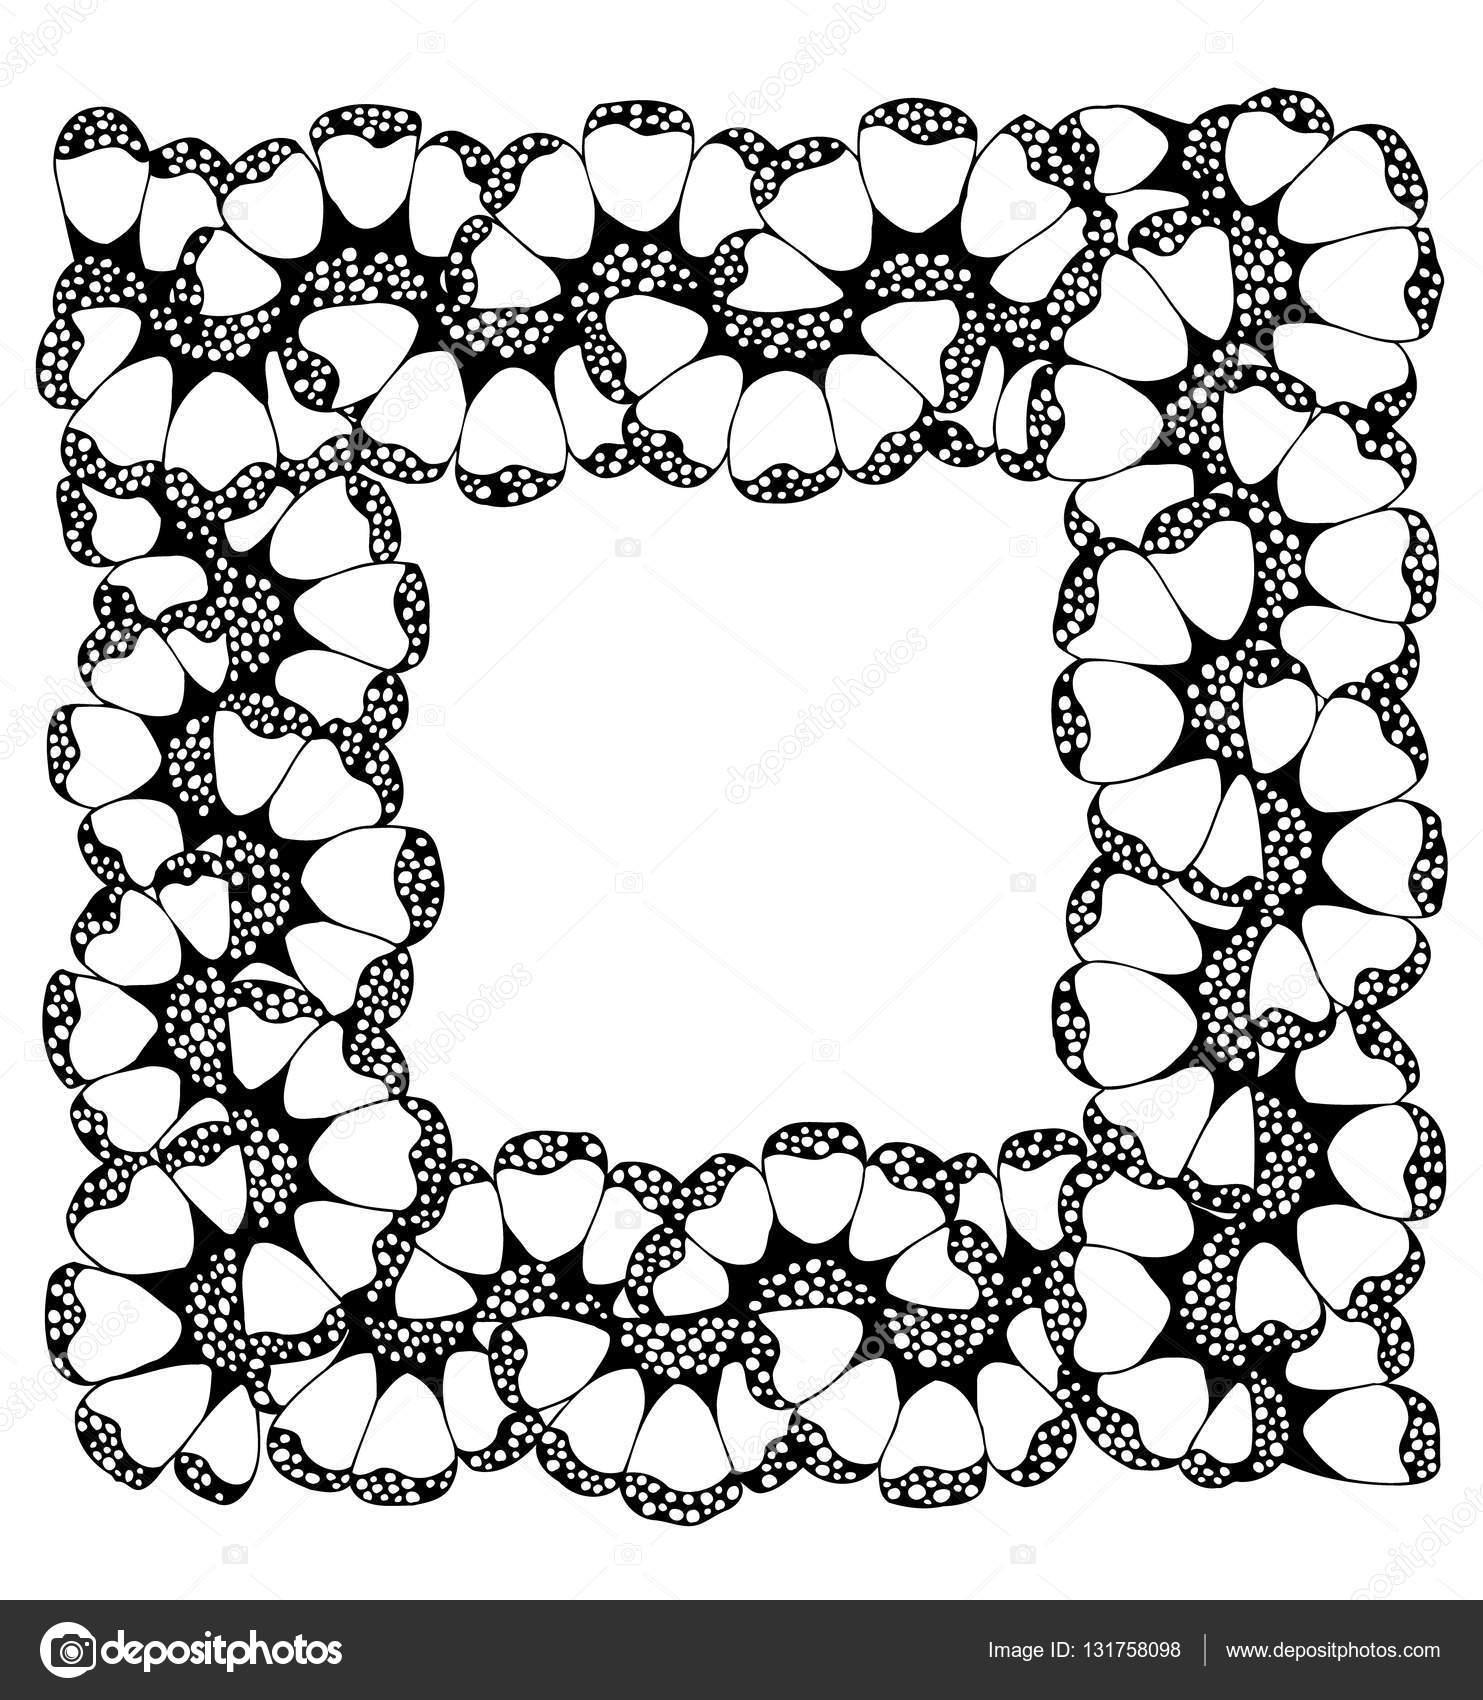 Fotorahmen. Vektor-Bild in schwarz / weiß — Stockvektor © maryafro ...